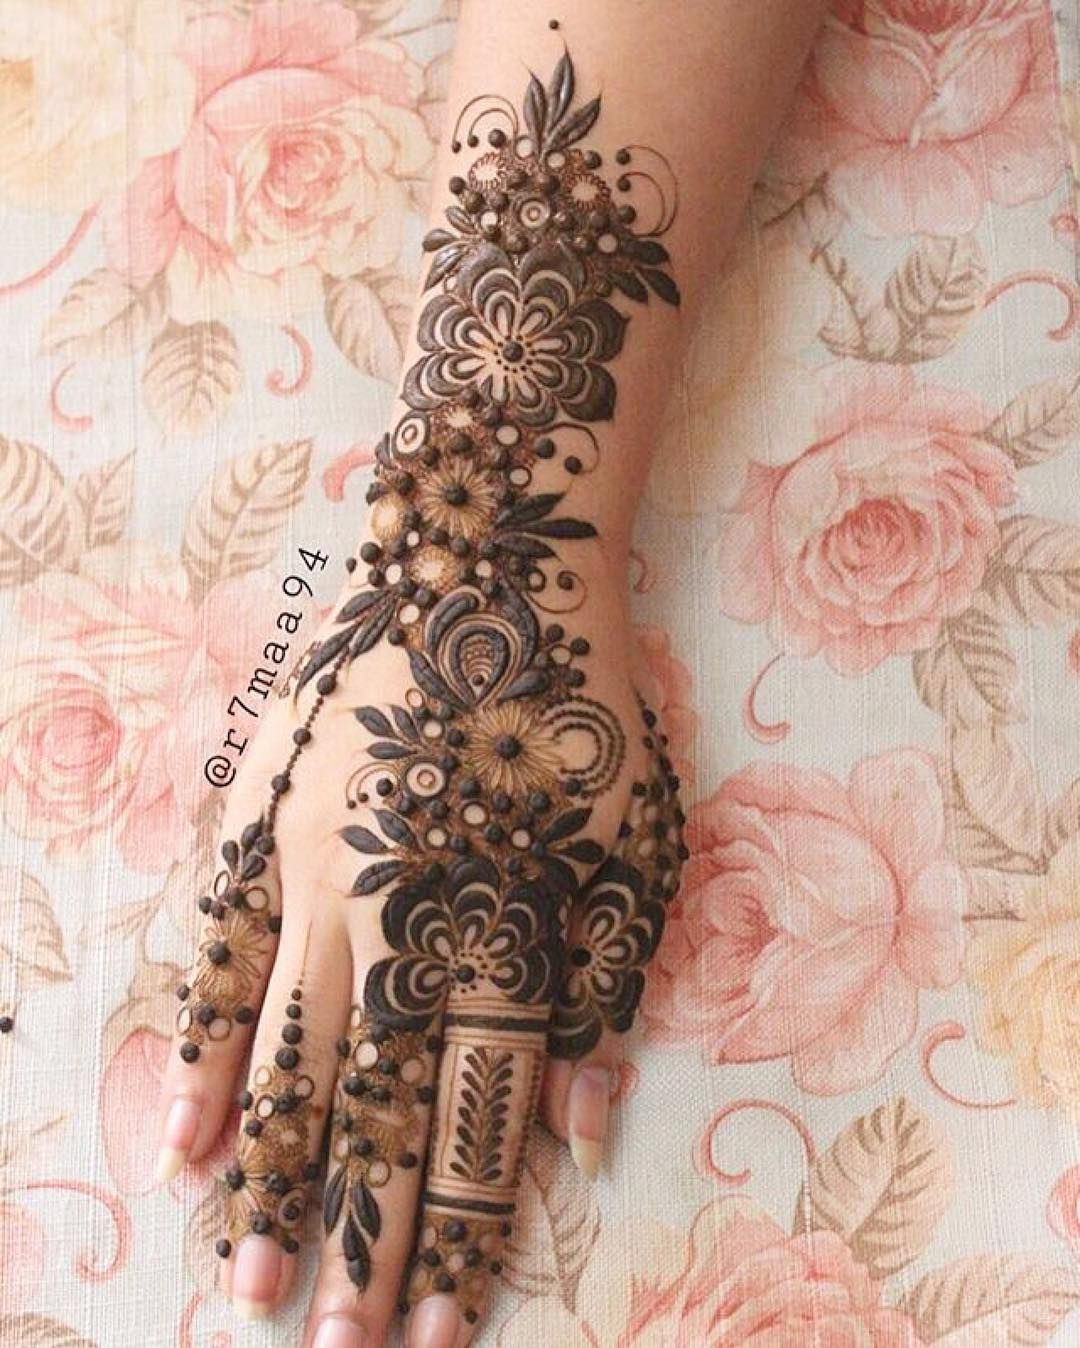 Lal Hatheli Khaleeji Henna Like No Other Repost R7maa94